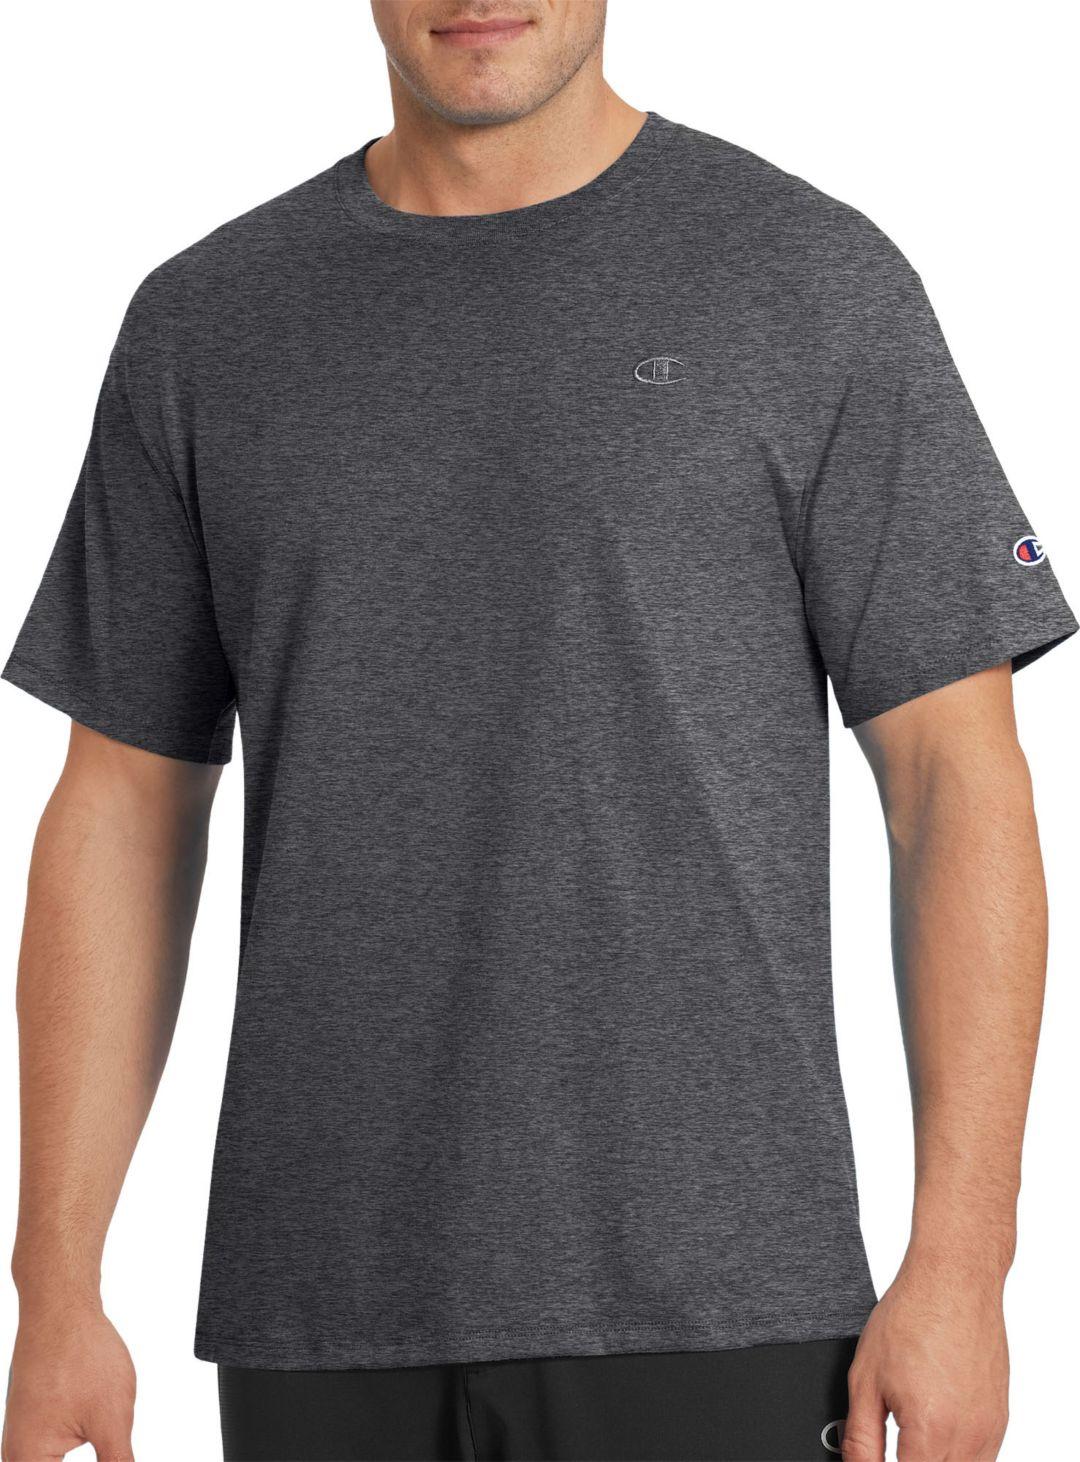 3a70f8fa7 Champion Men's Classic Jersey 2.0 T-Shirt